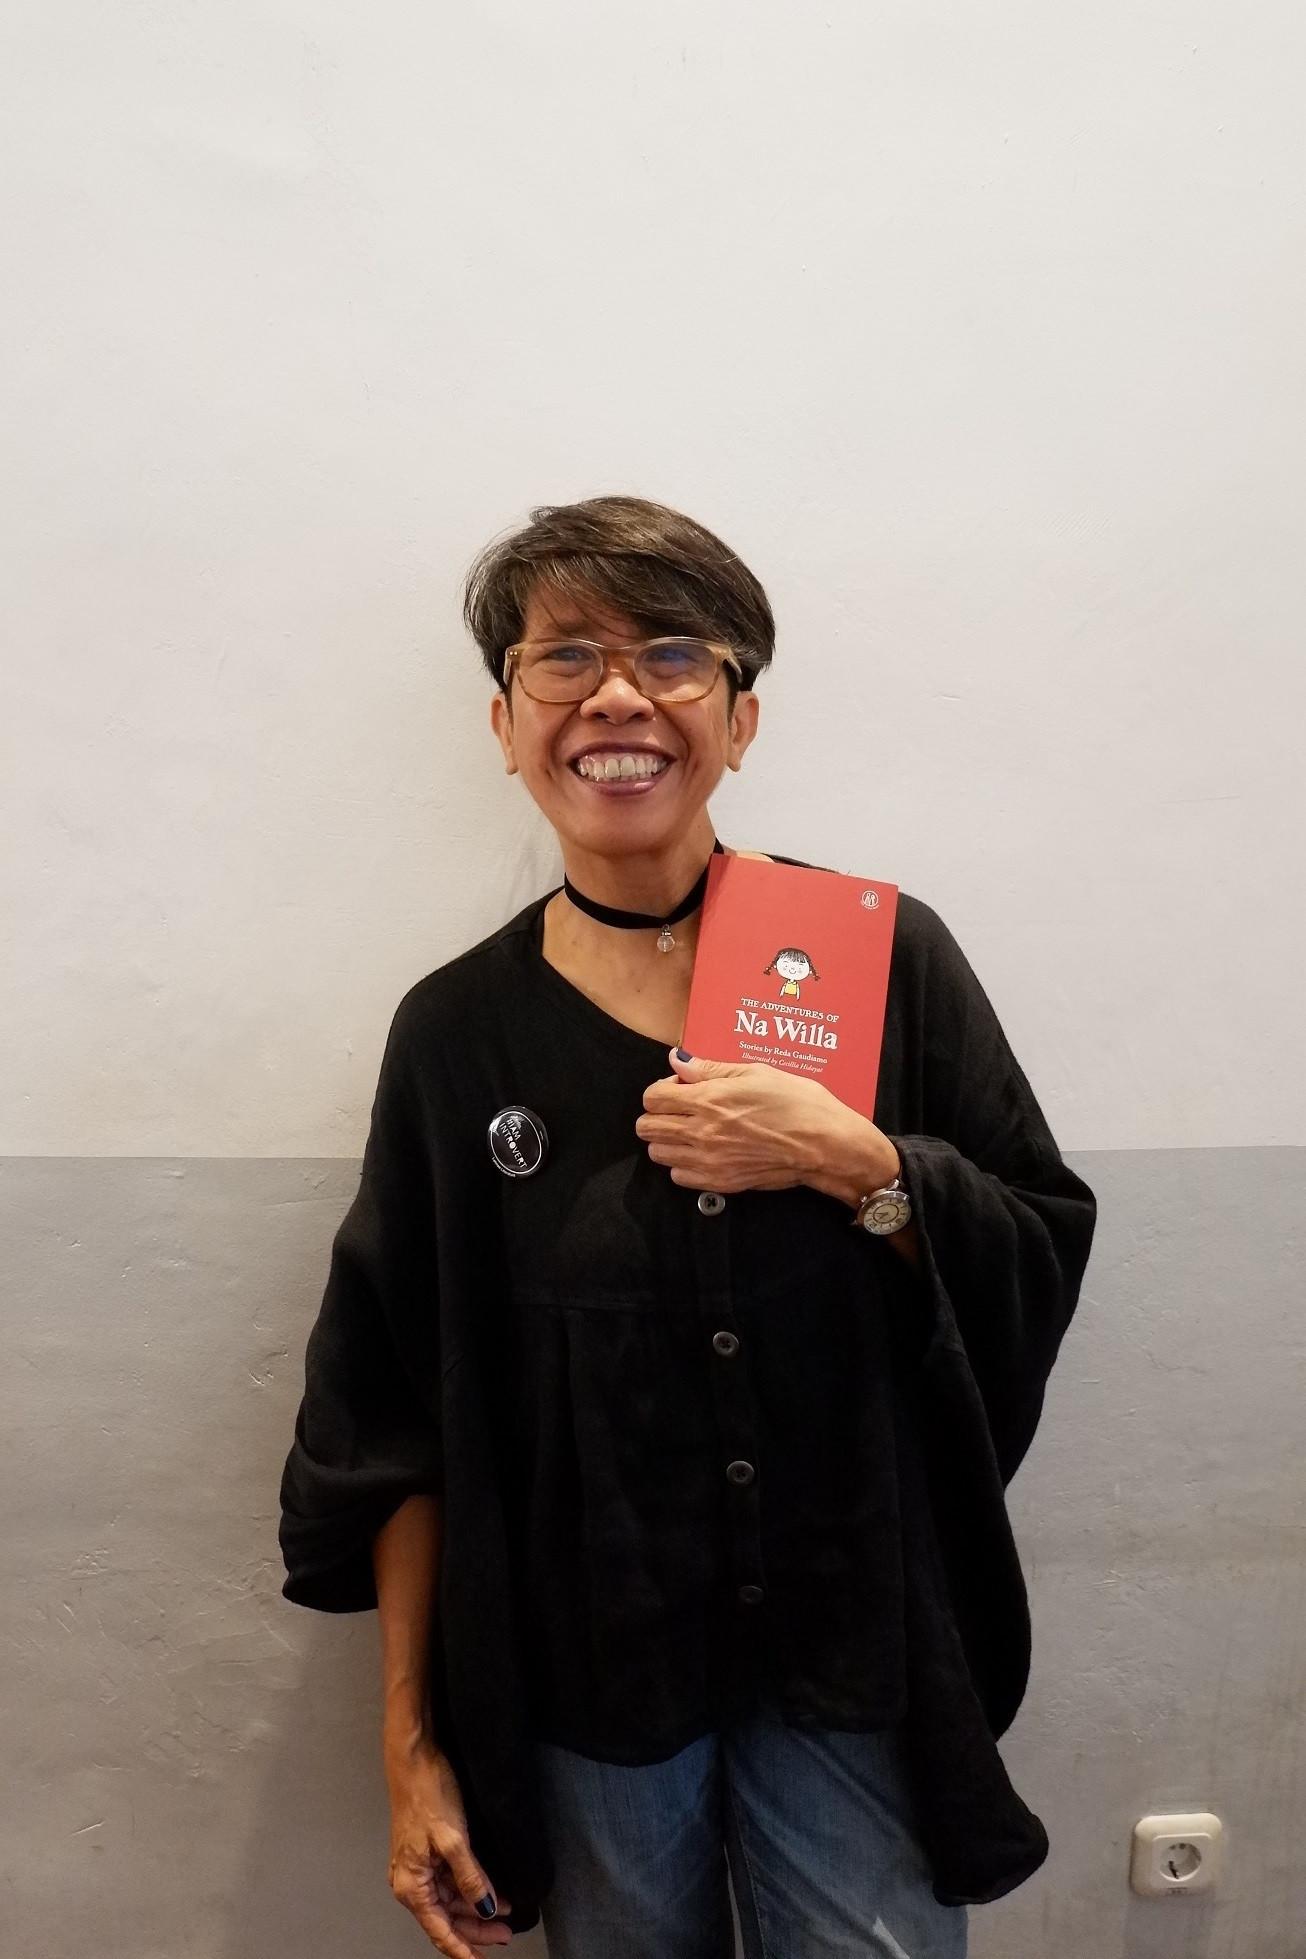 Reda Gaudiamo's journey from aspiring writer to London Book Fair star